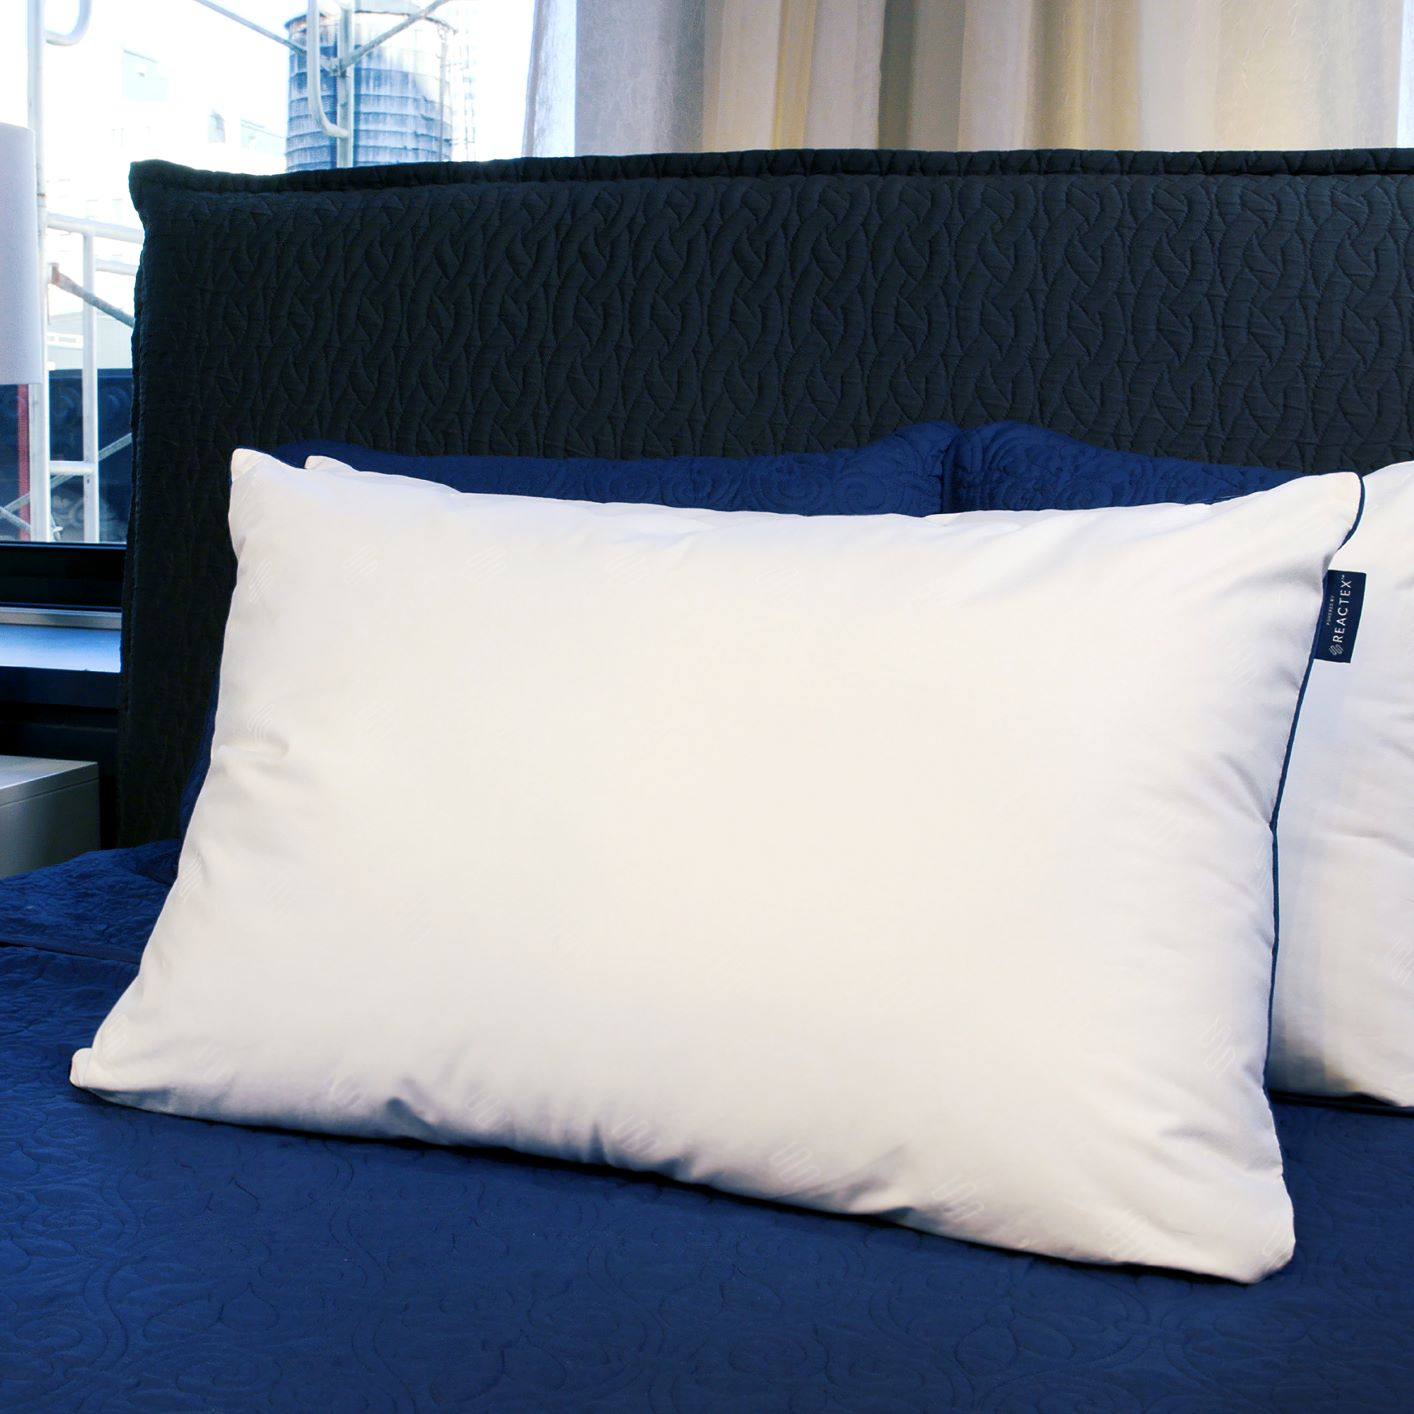 Therapedic® Polar Nights™ 20x Cooling Down Alternative Pillow